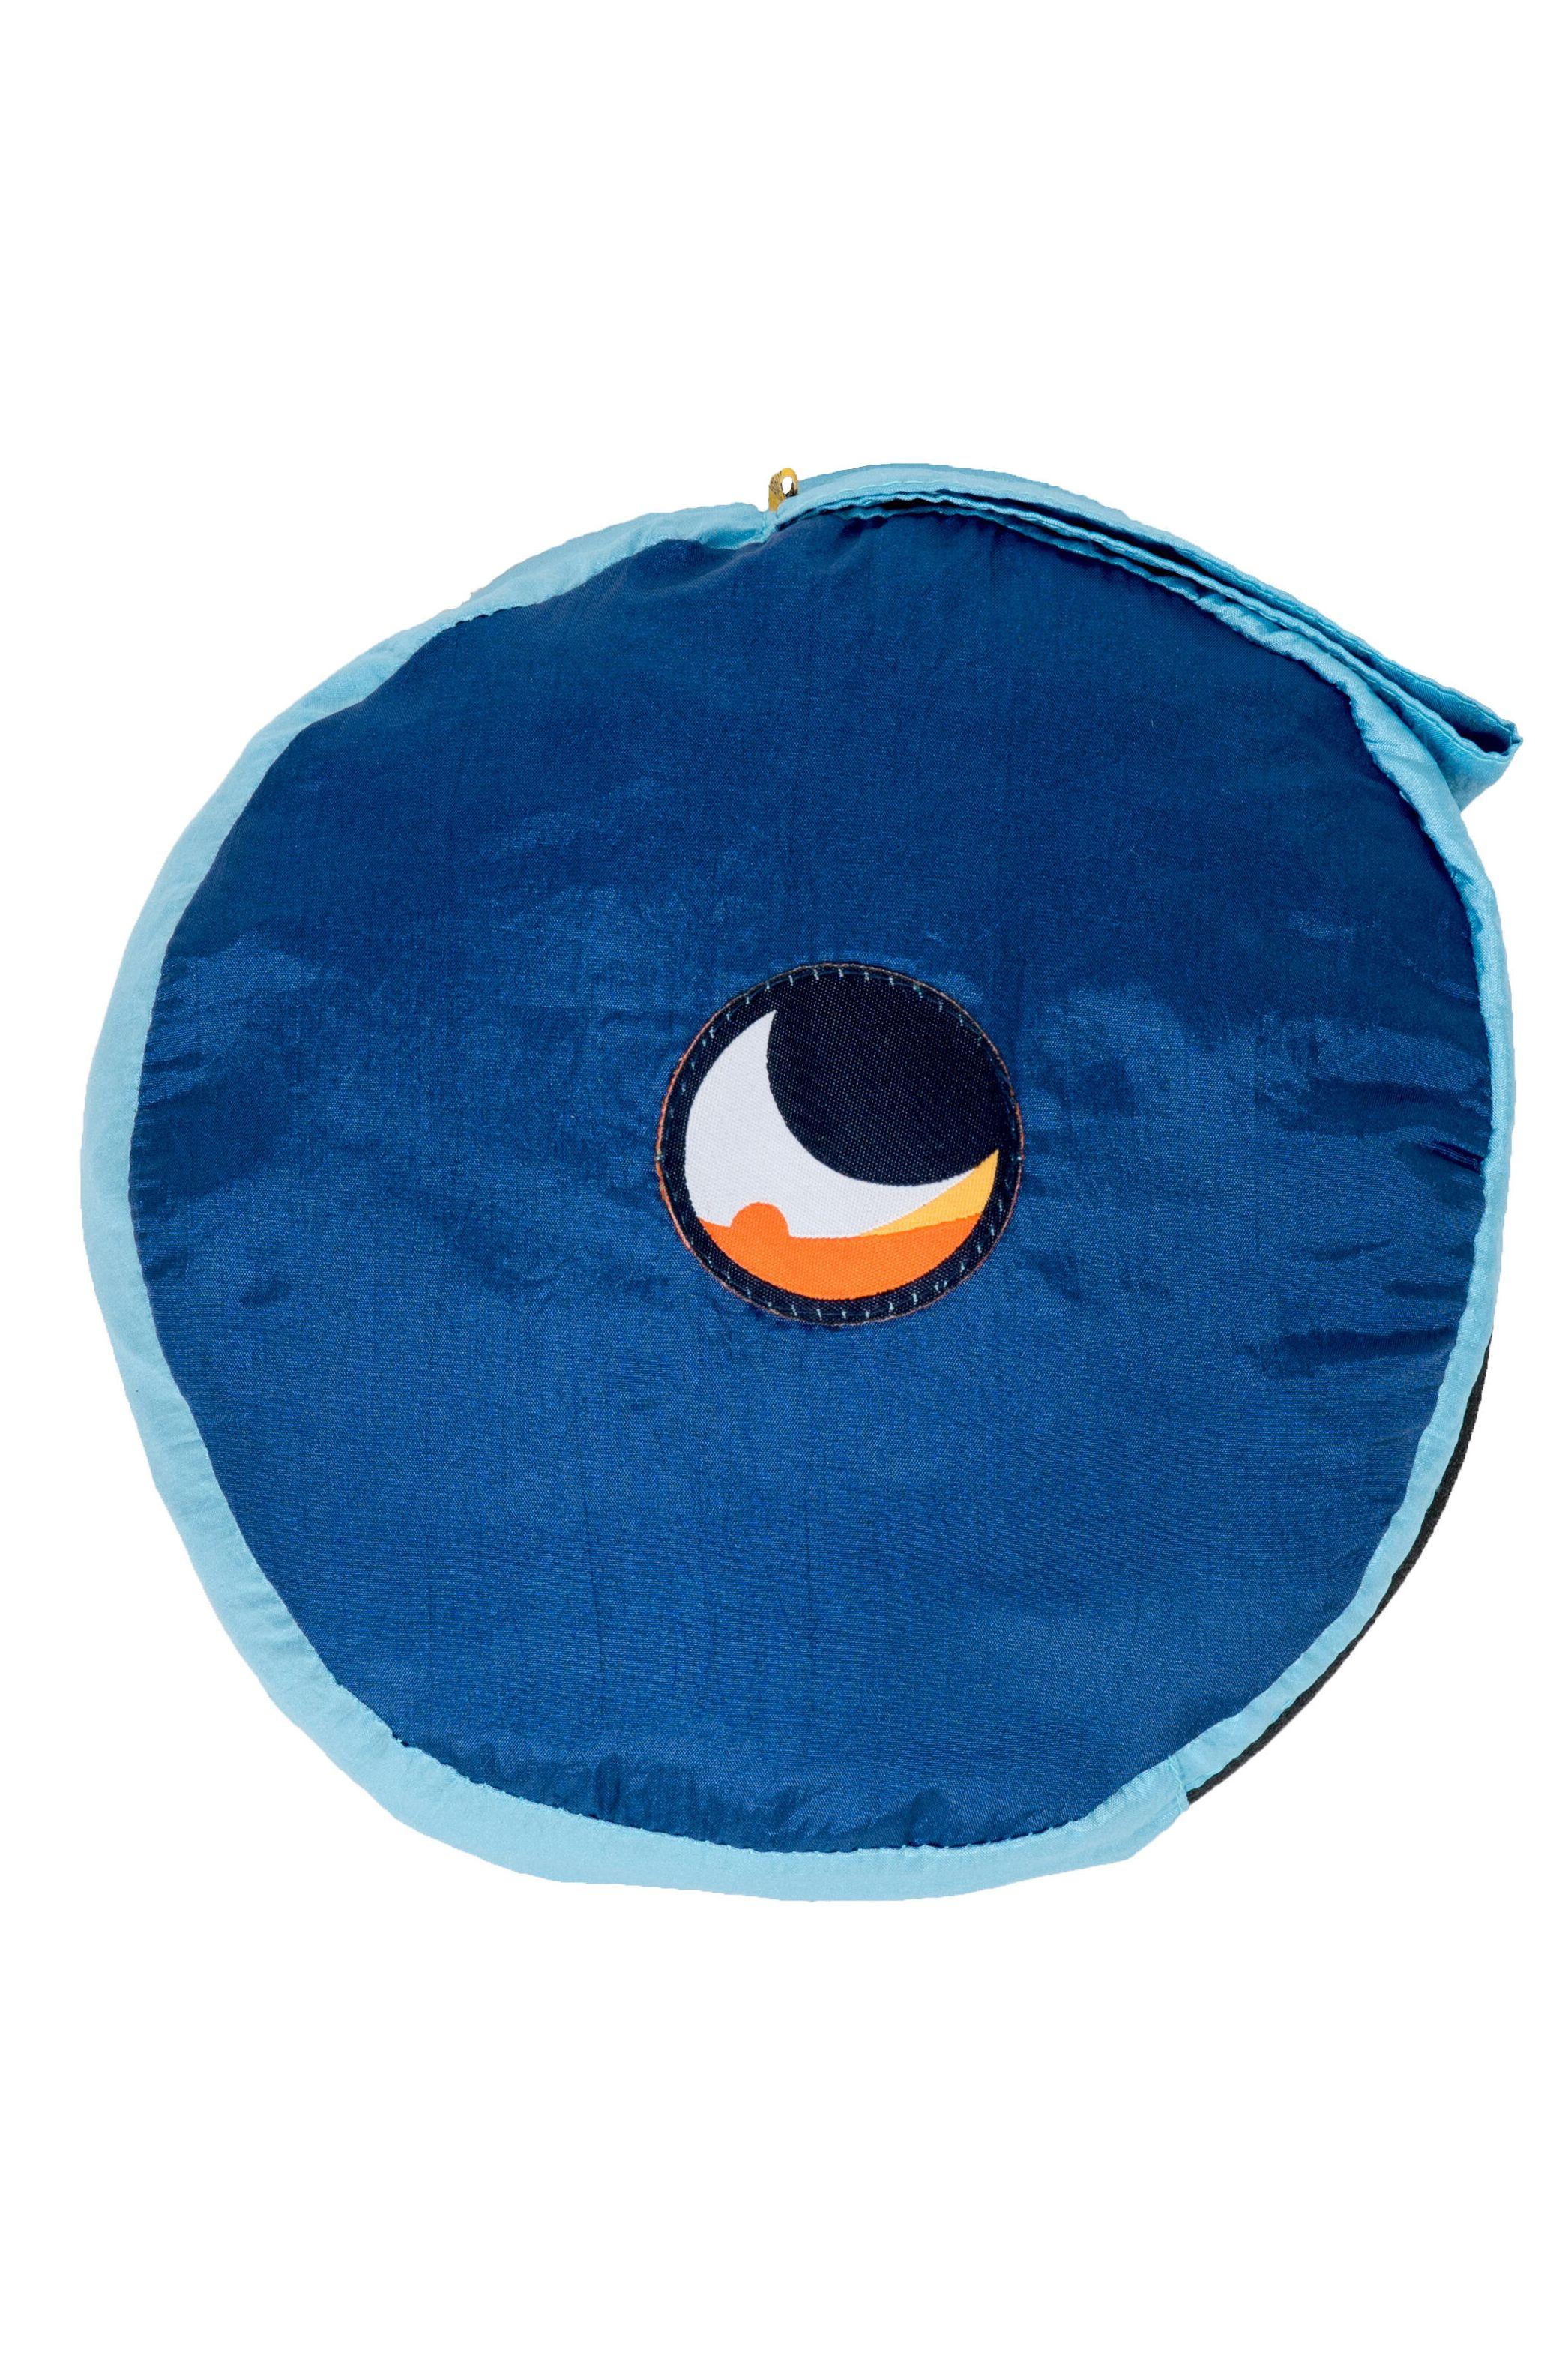 Toalha Ticket To The Moon BEACH BLANKET Royal Blue/Sky Blue